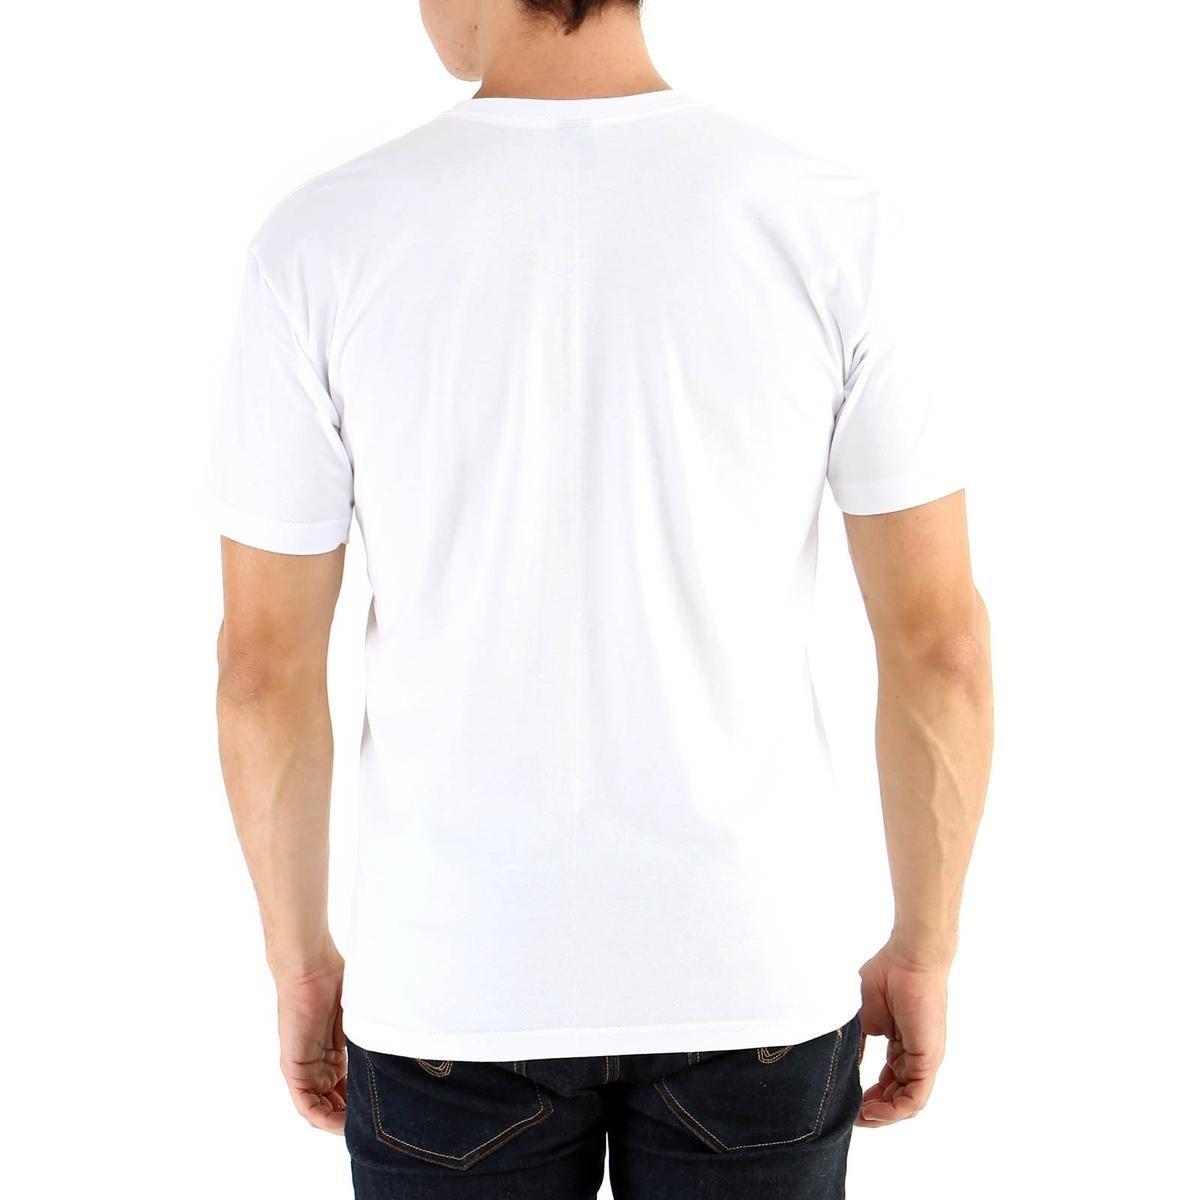 Camiseta Ouroboros manga curta Fight - Branco